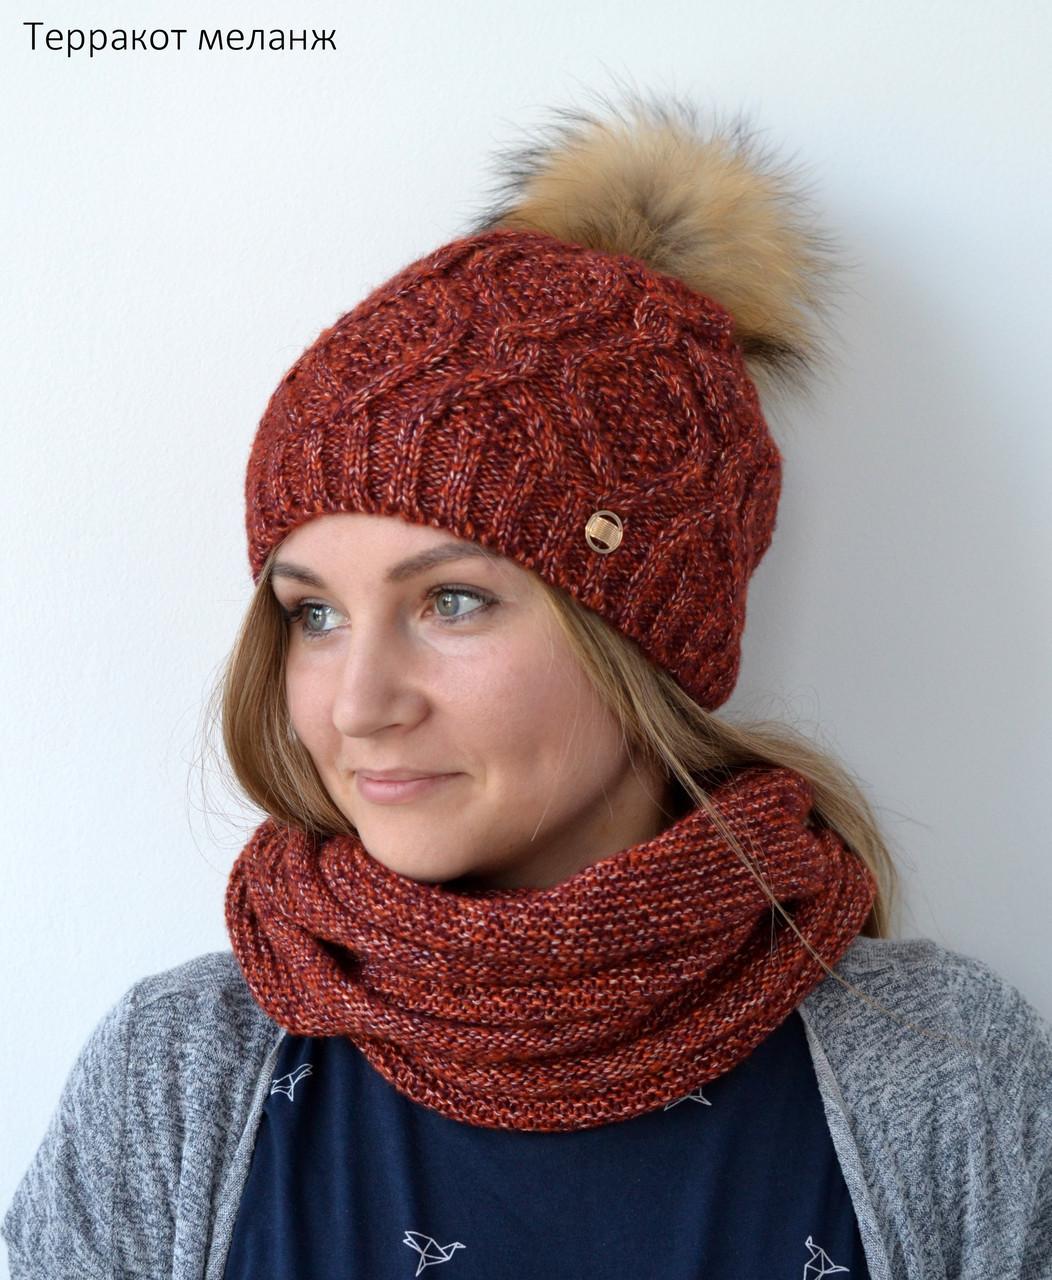 Зимняя шапка женская 2018 вязаная